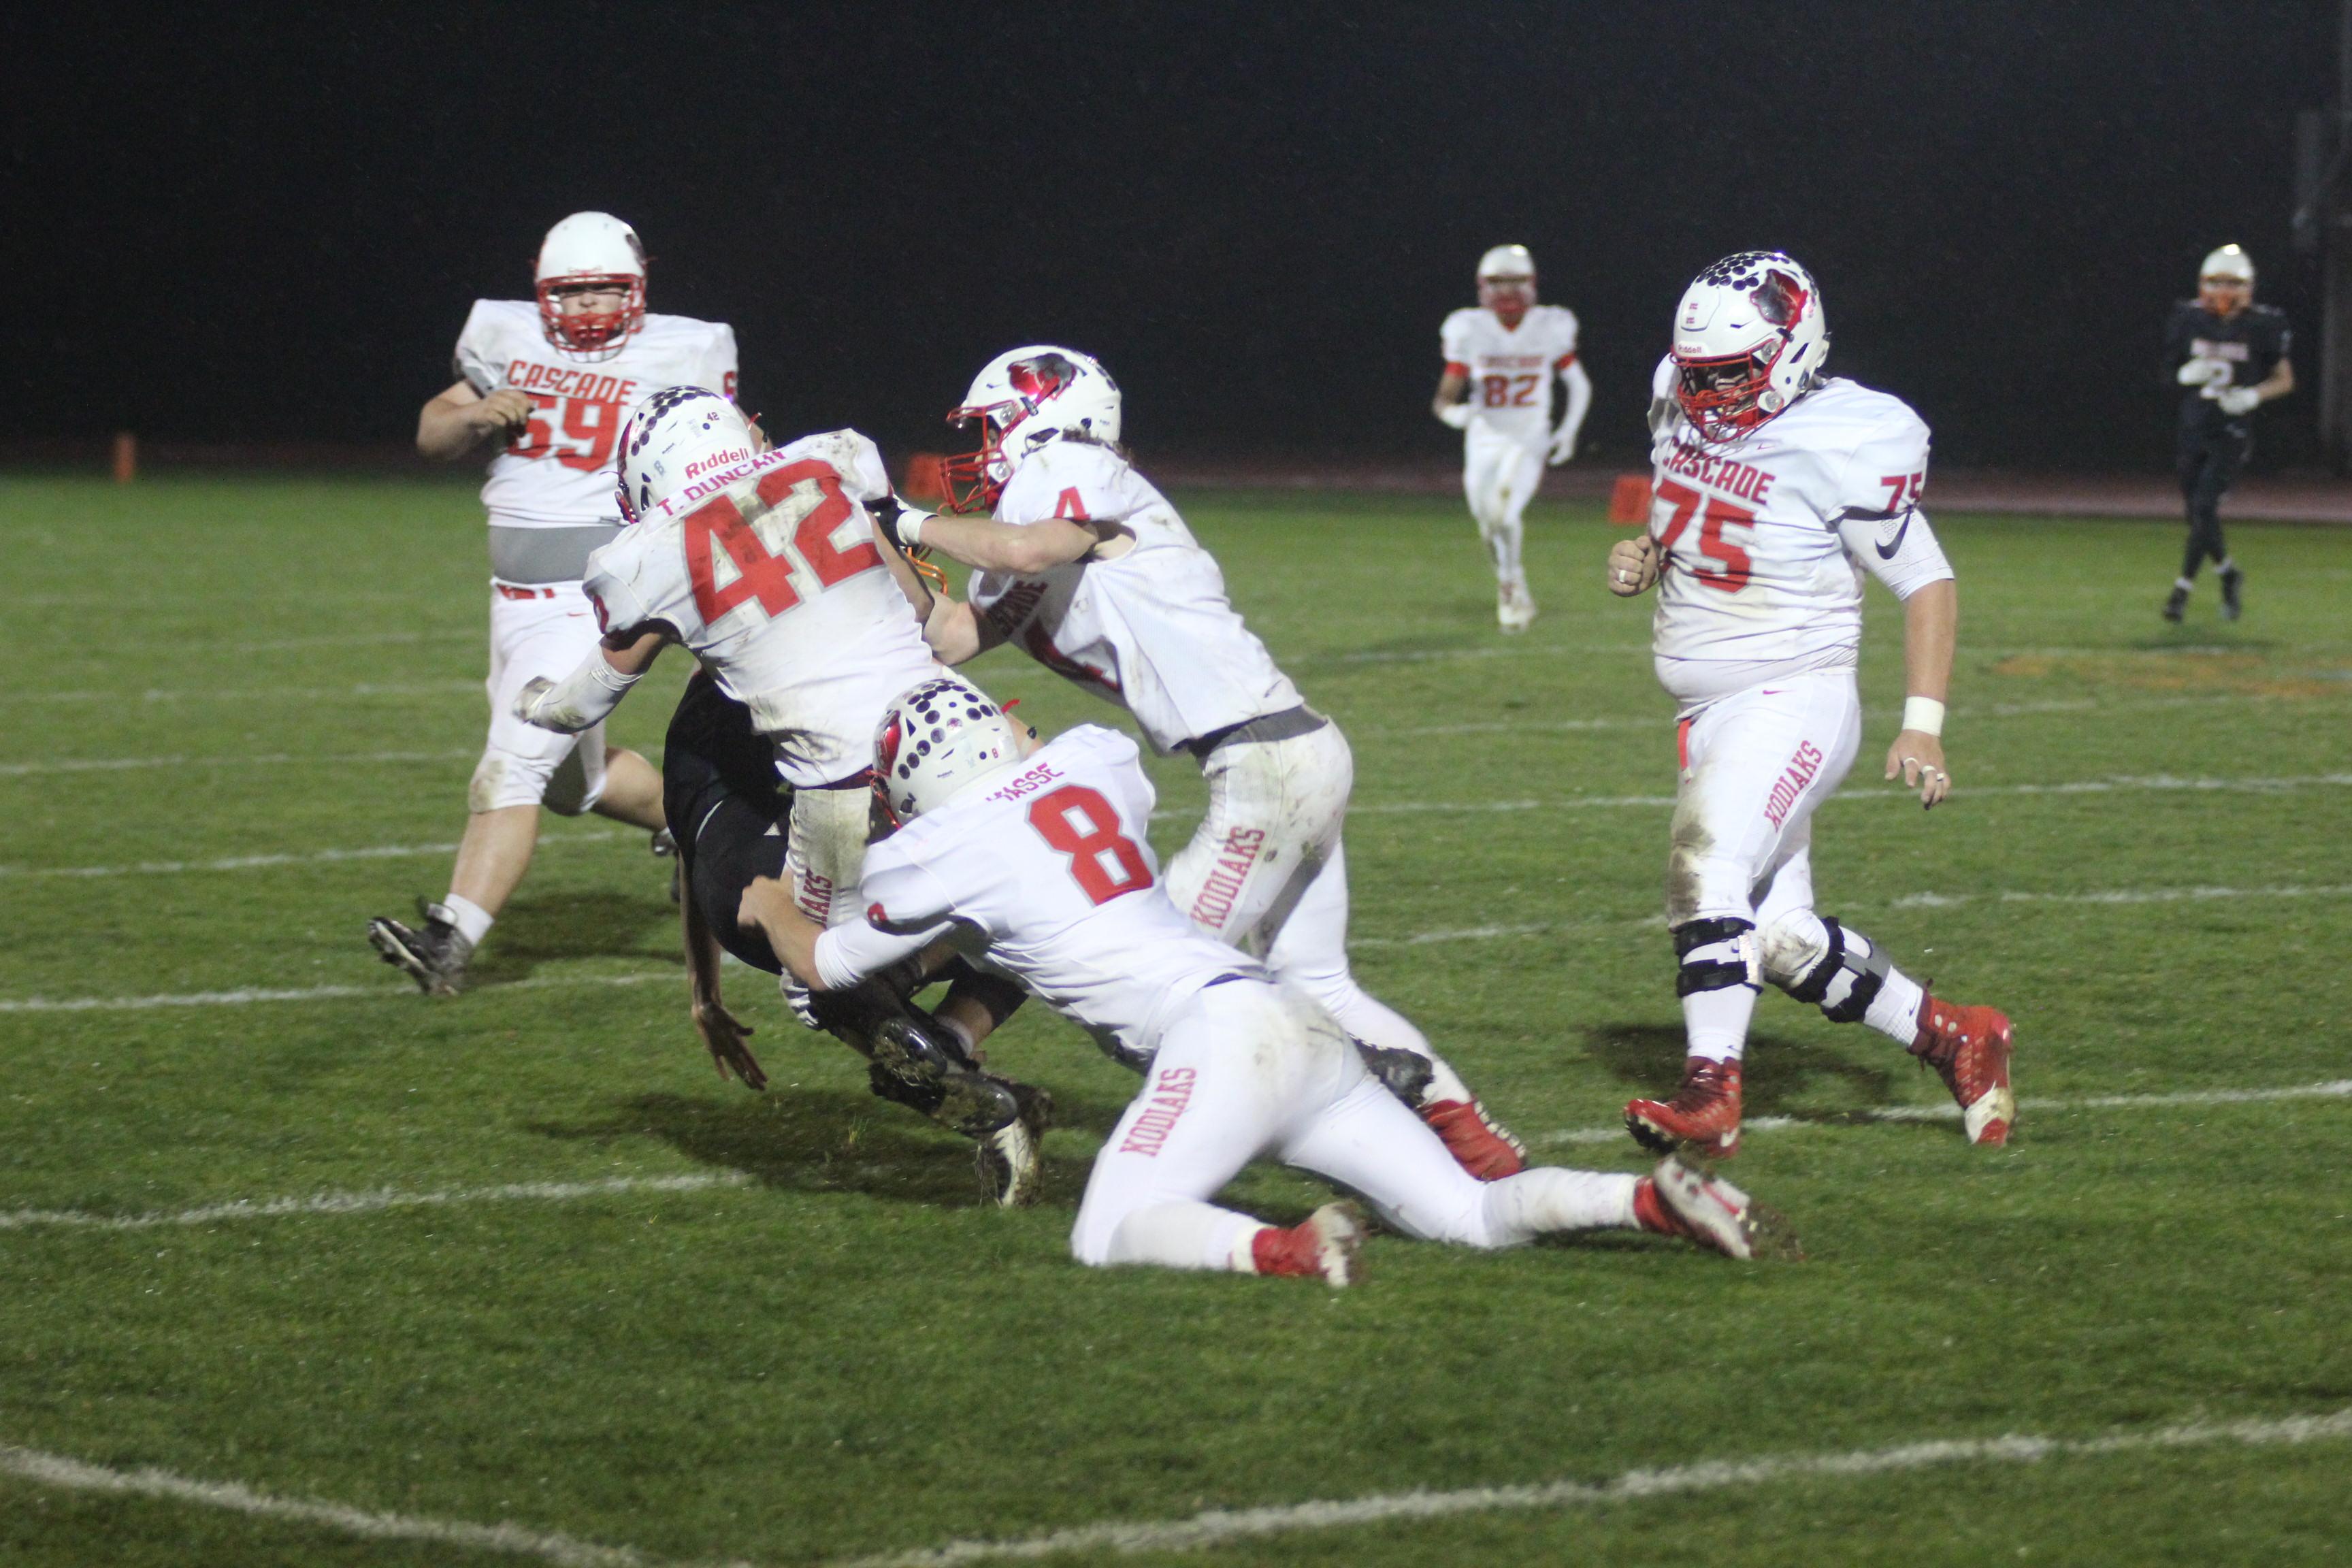 Kodiaks tackle in a group effort.